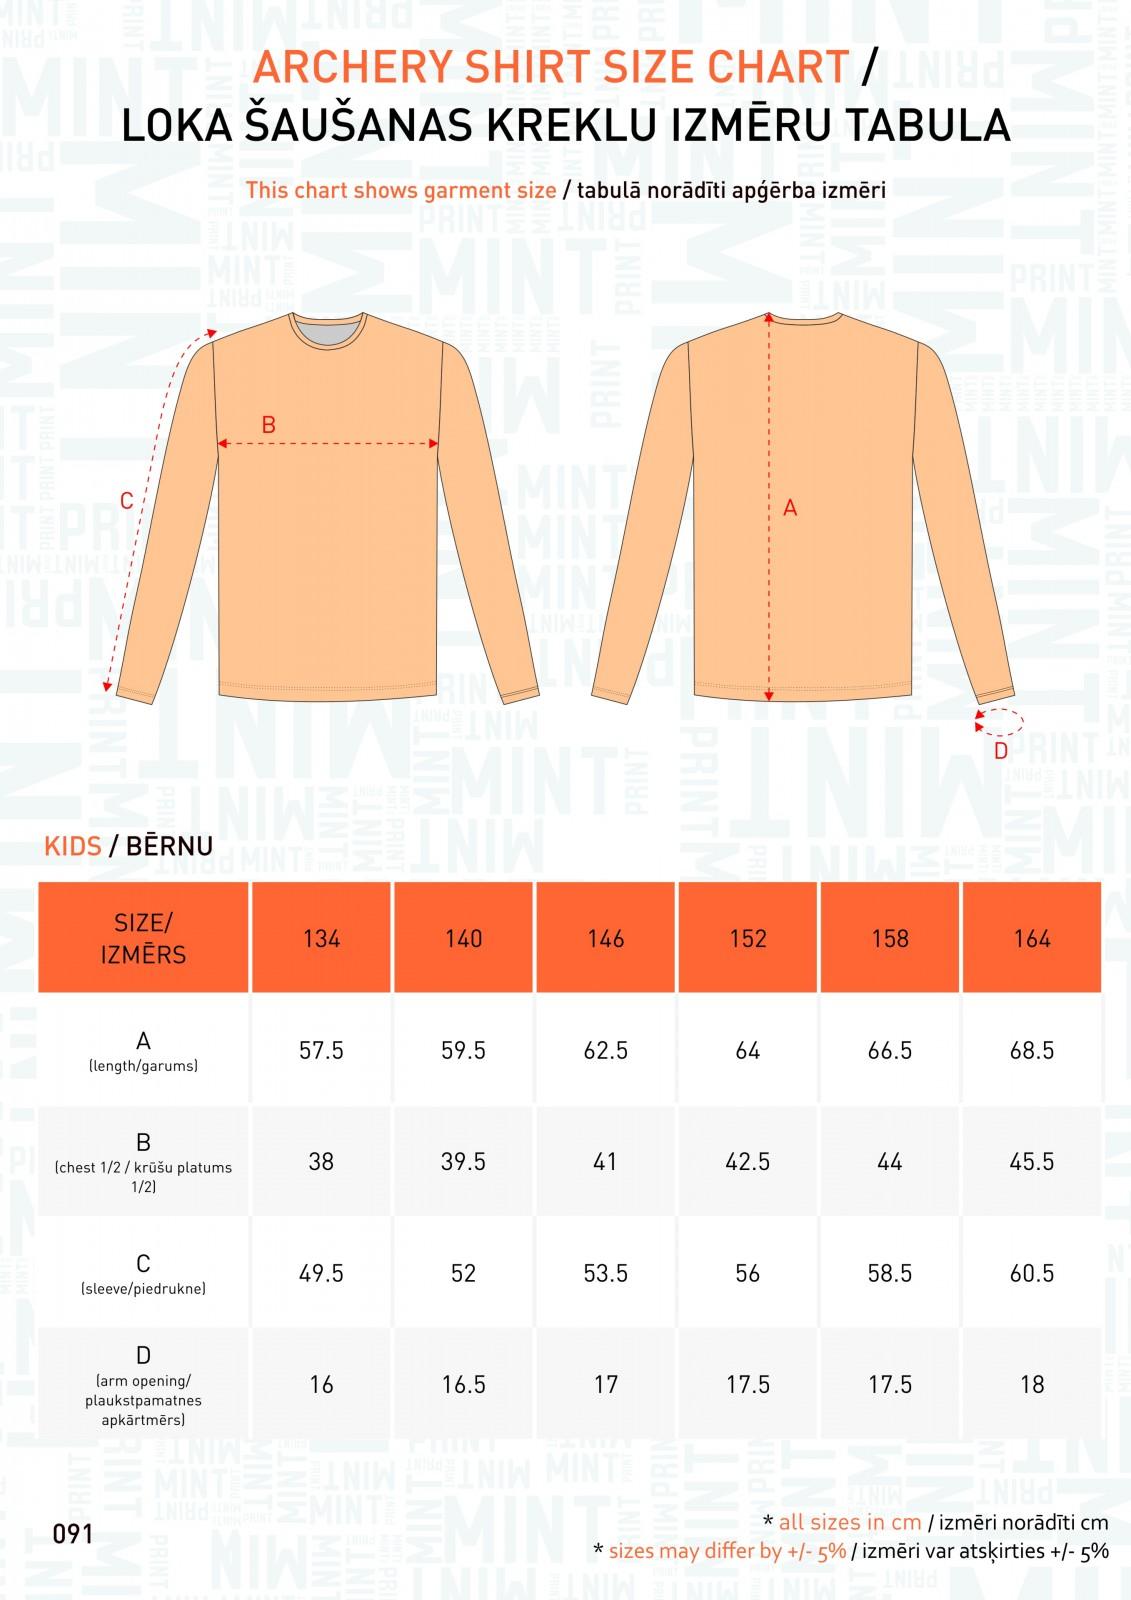 091 - Archery kreklu izm tabulas - KIDS